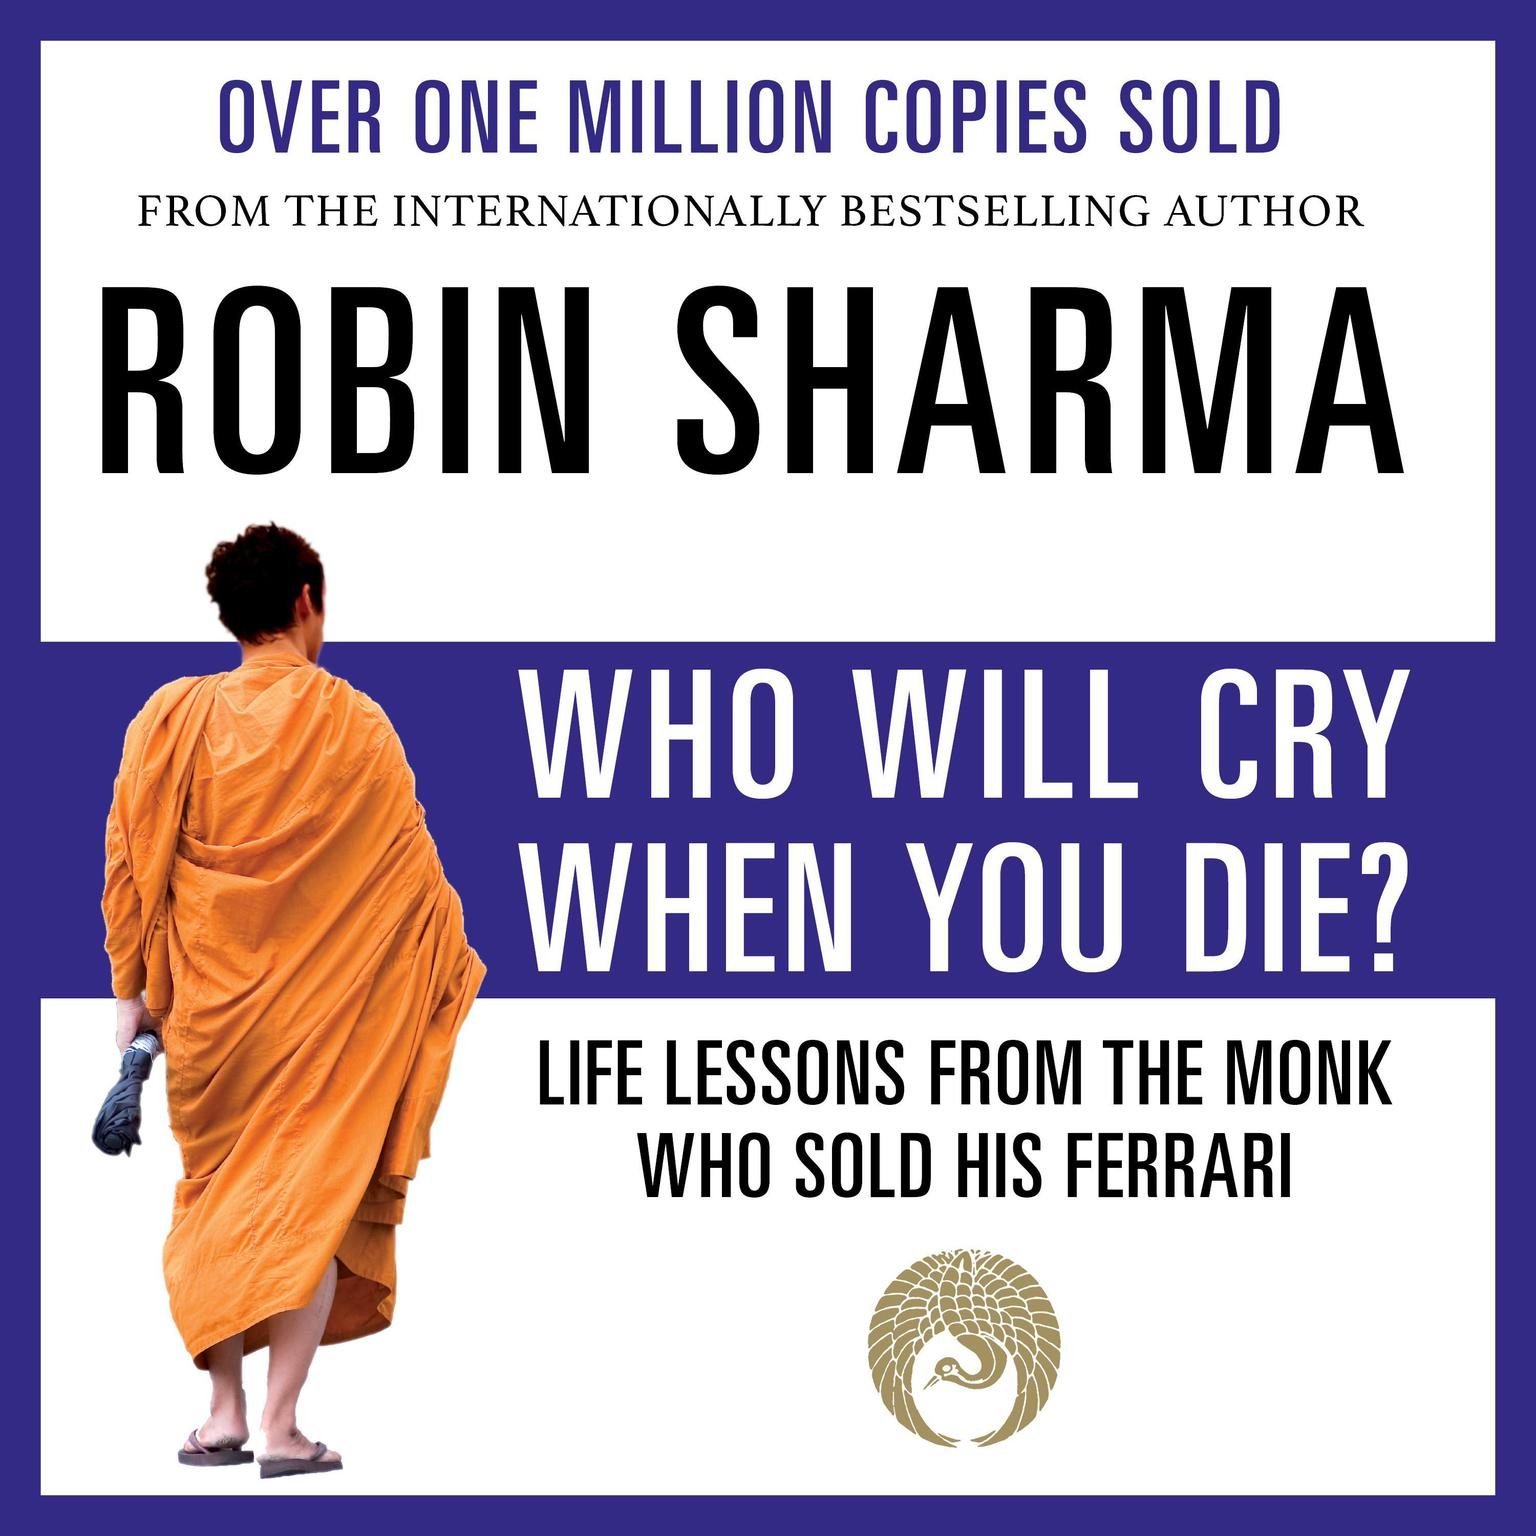 Robin sharma audio book free download by jelfizzburpau issuu.